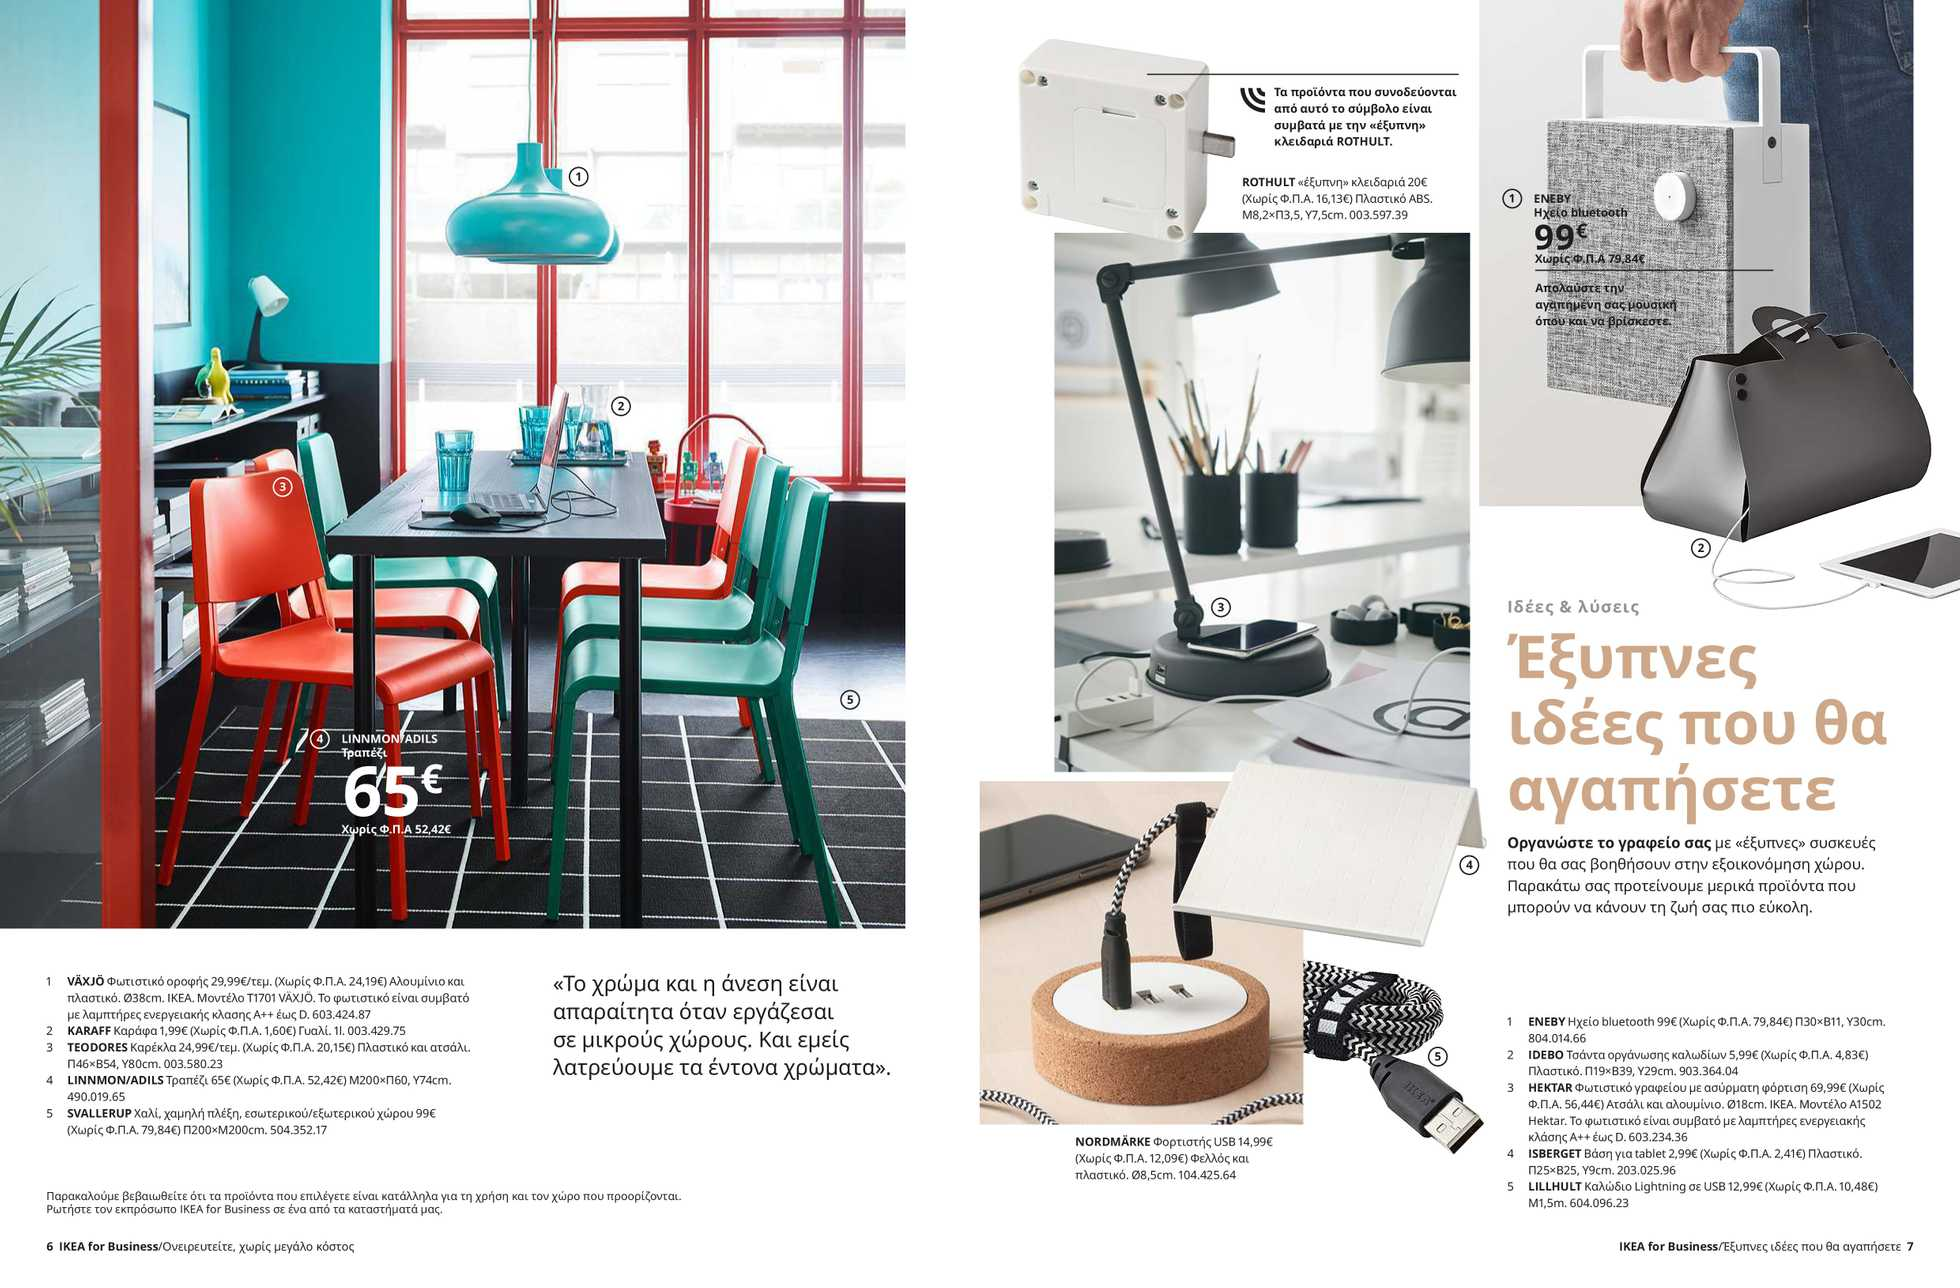 IKEA - η προσφορά ισχύει από 01.01.2020 μέχρι 15.08.2020 - σελίδα 4.